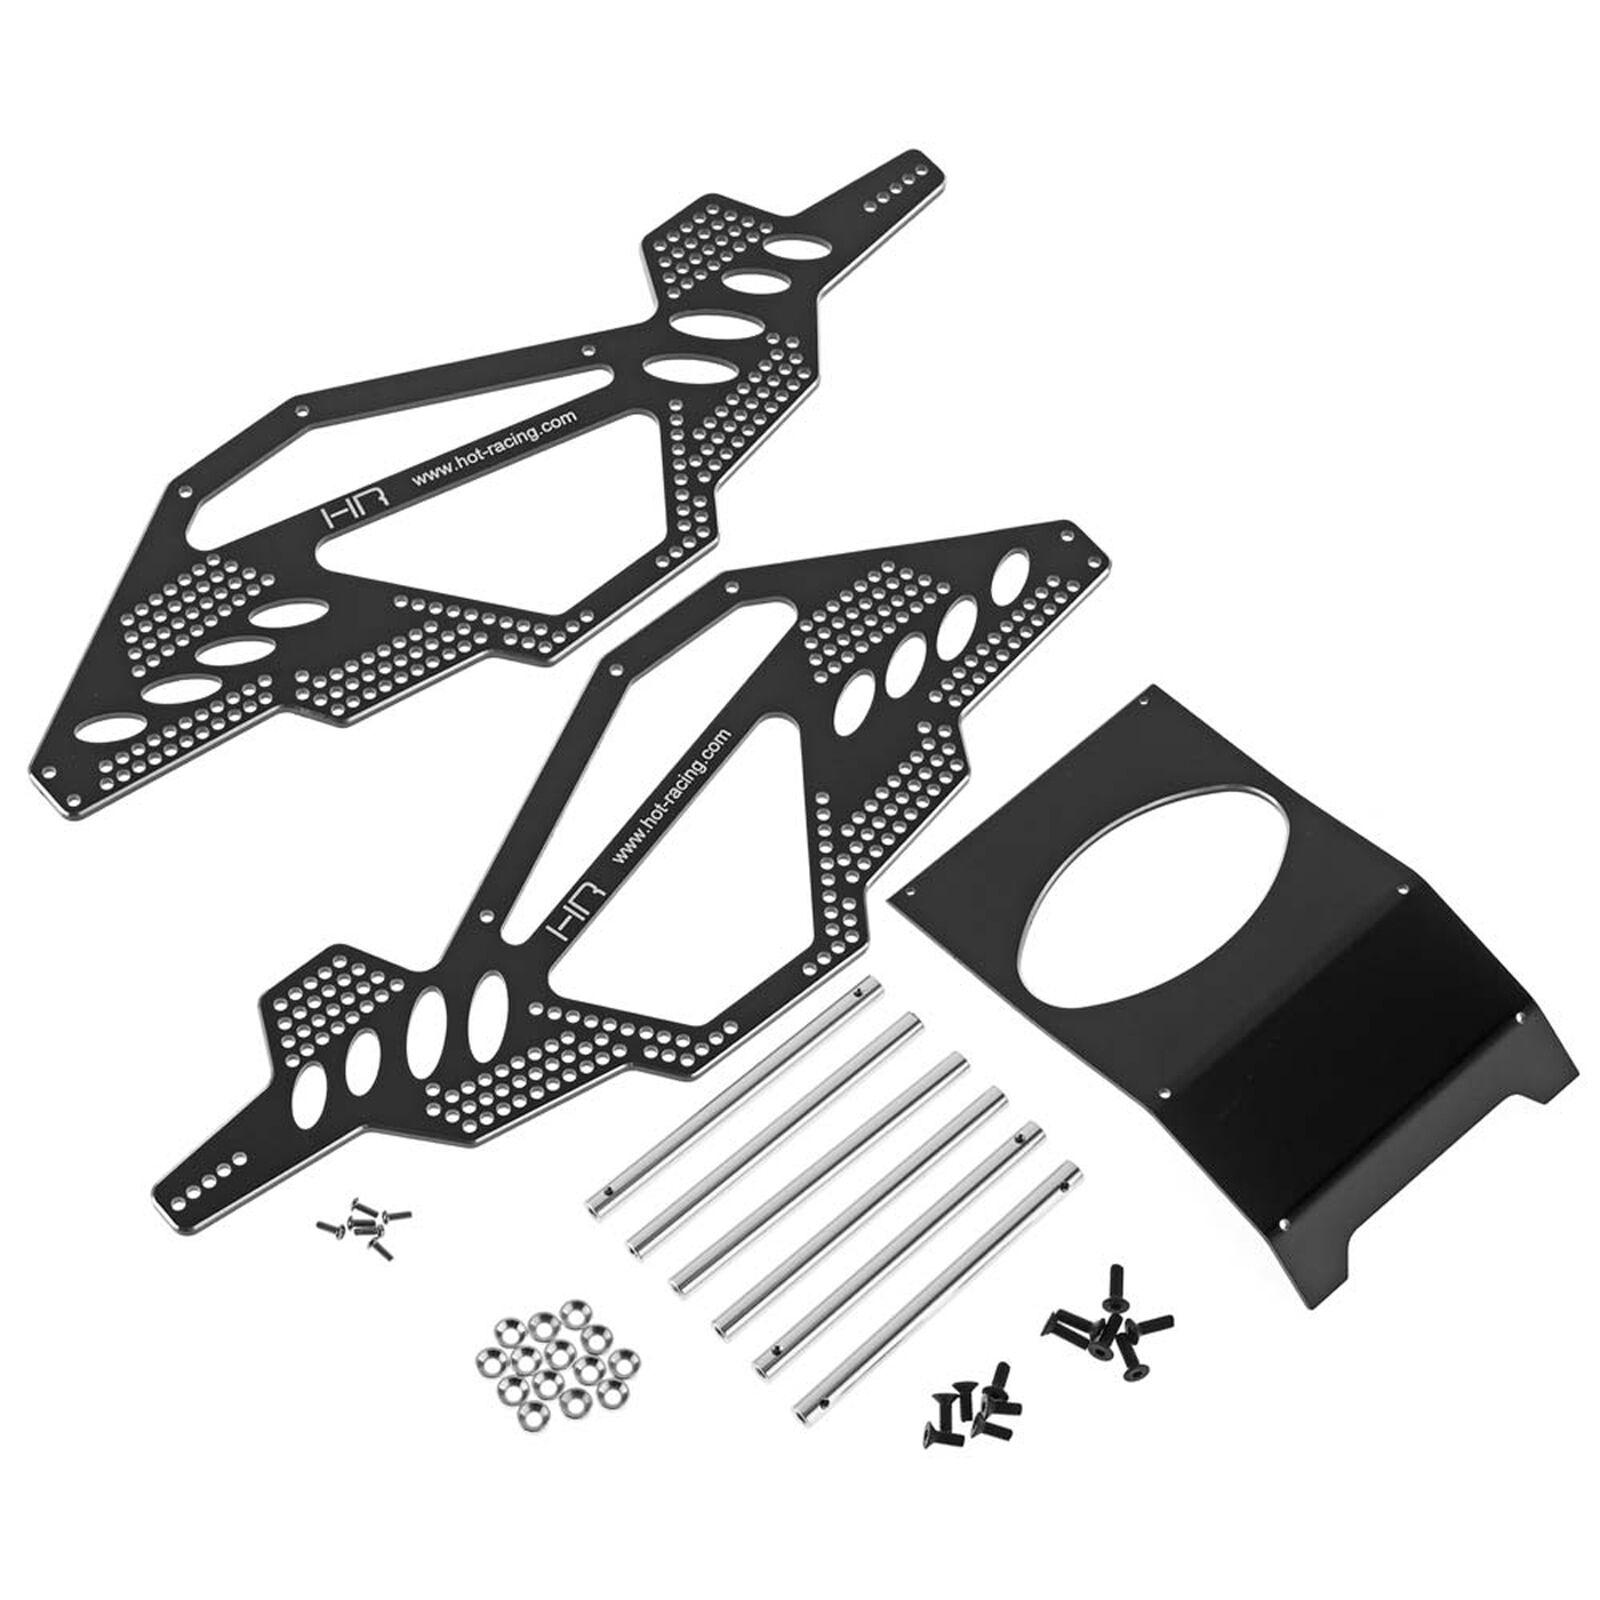 Aluminum Rock Racer Conversion Chassis, Black: Ax10